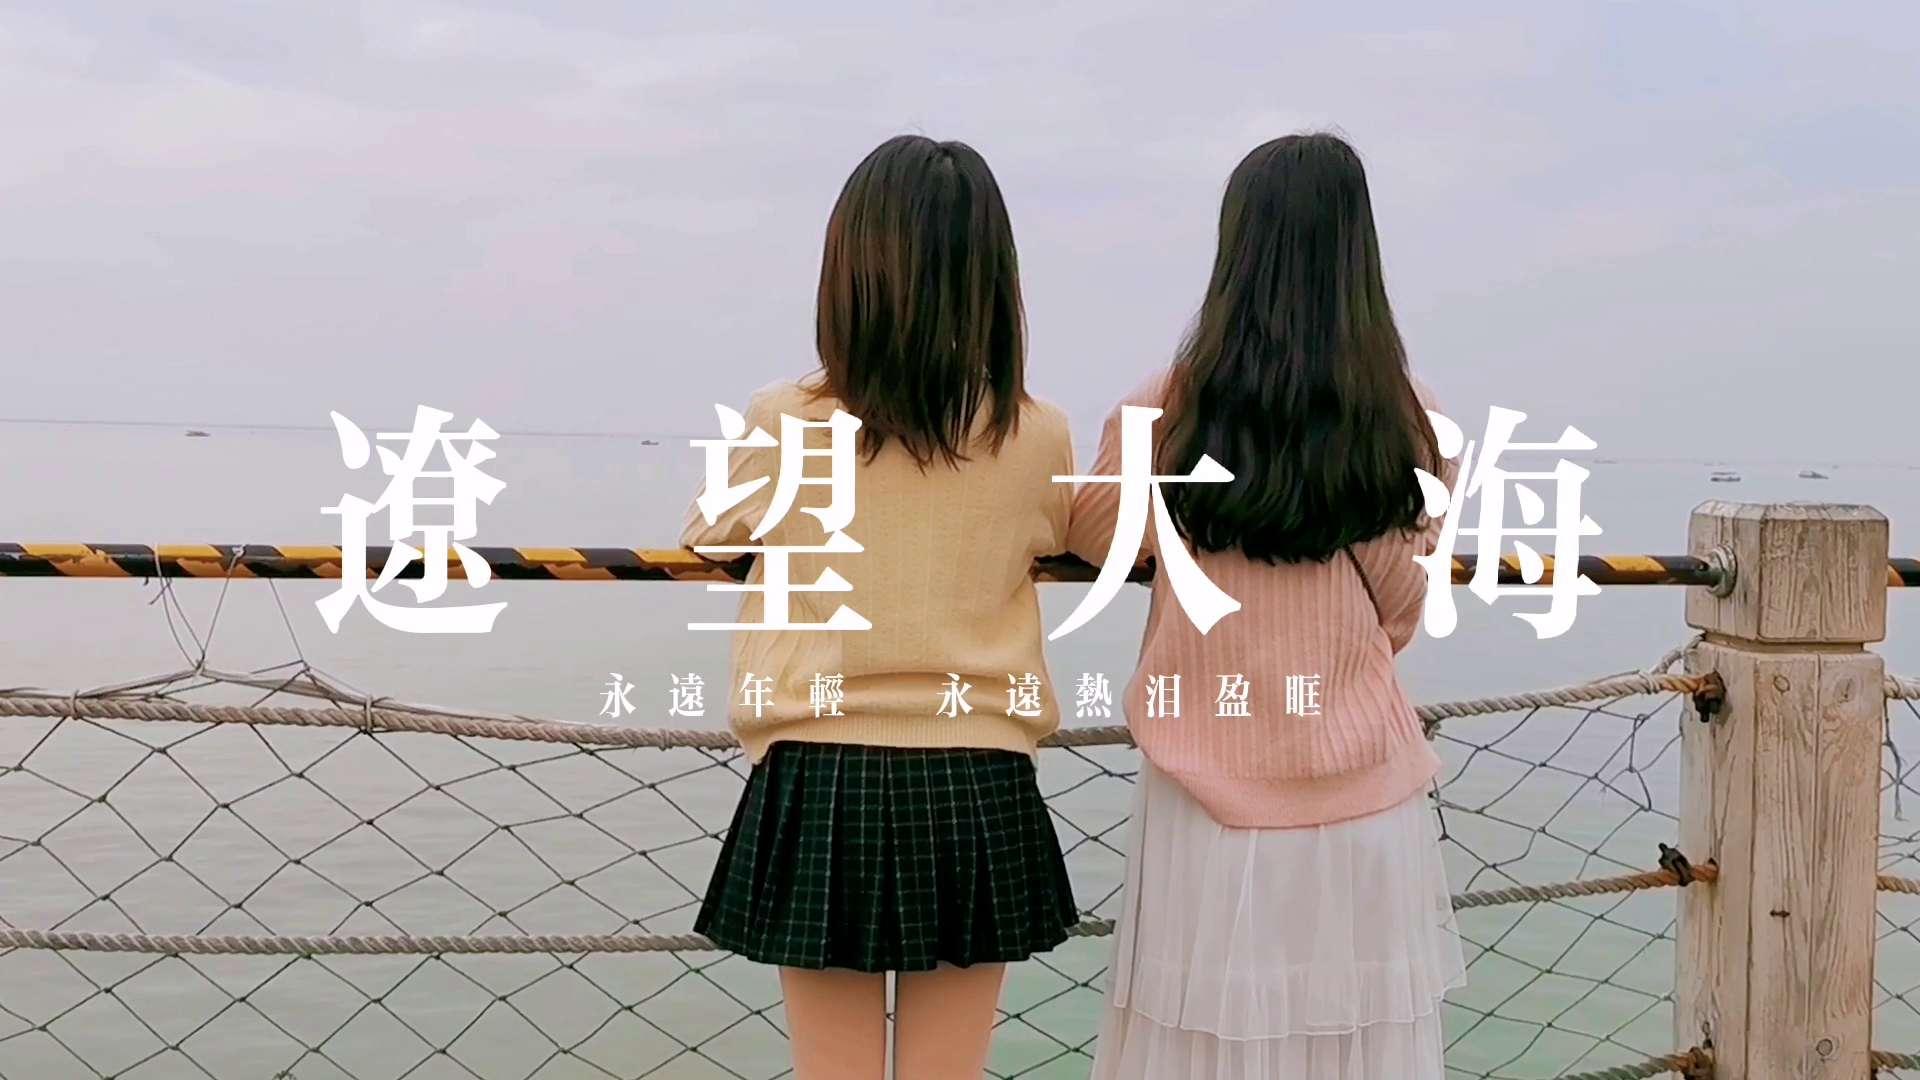 【P30pro】遼望大海,花粉随手拍-花粉俱乐部